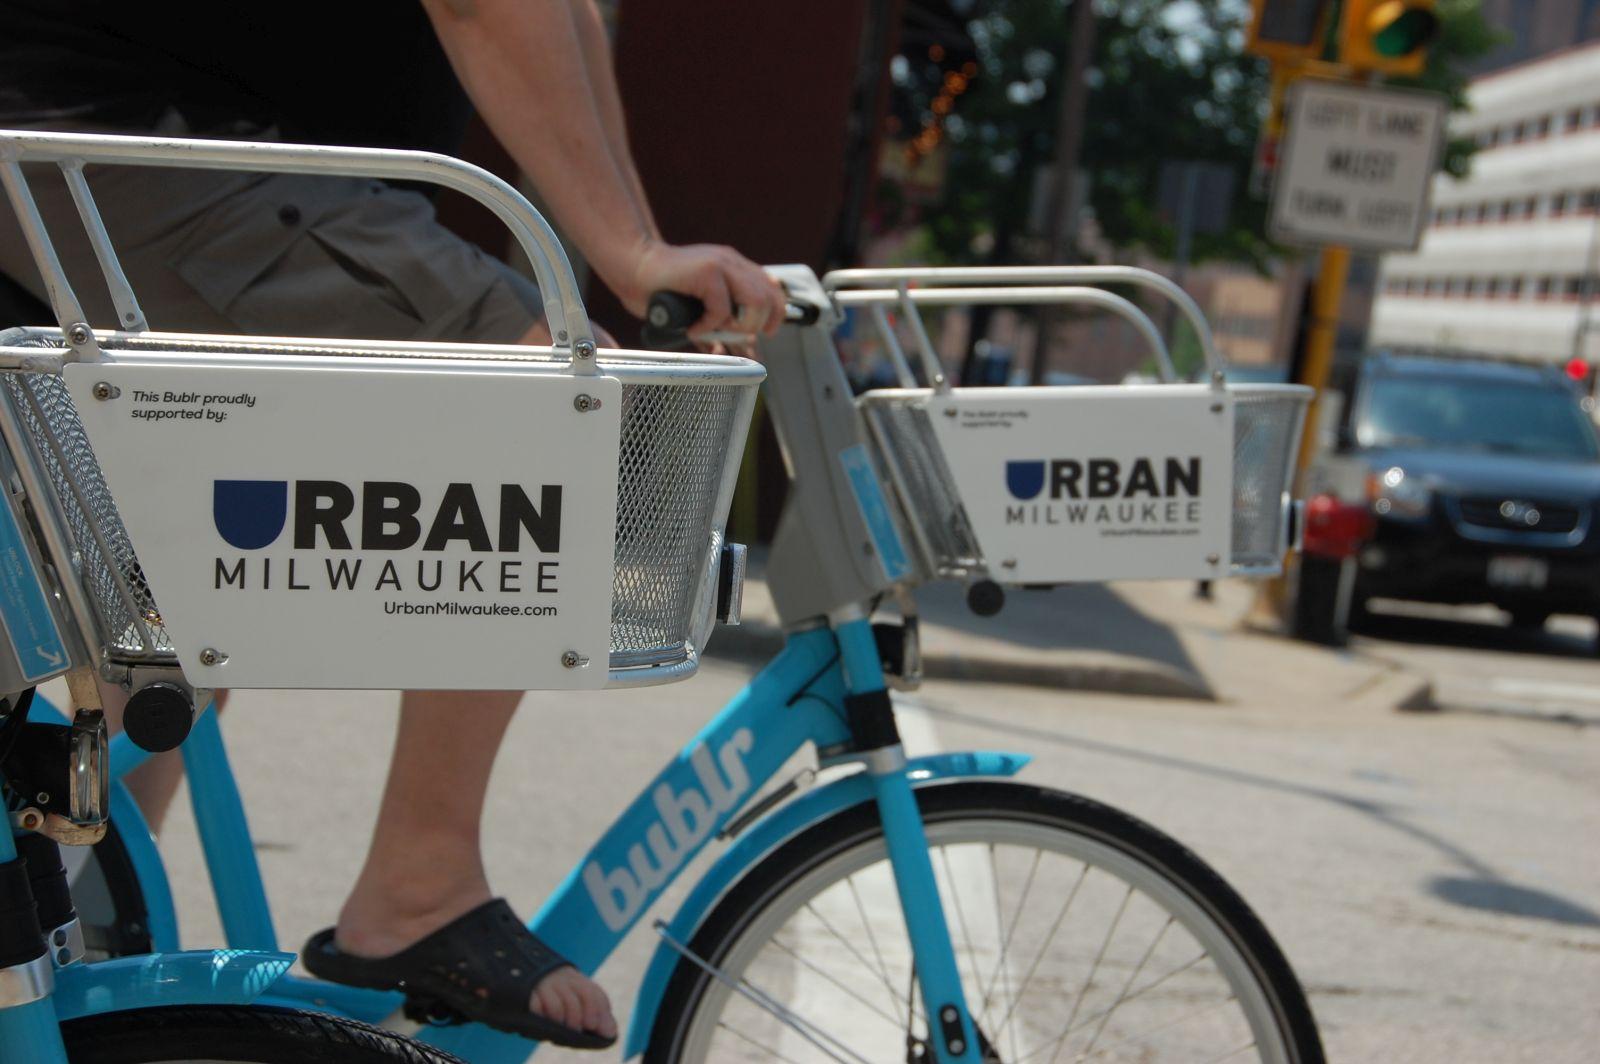 Urban Milwaukee Bublr Bike